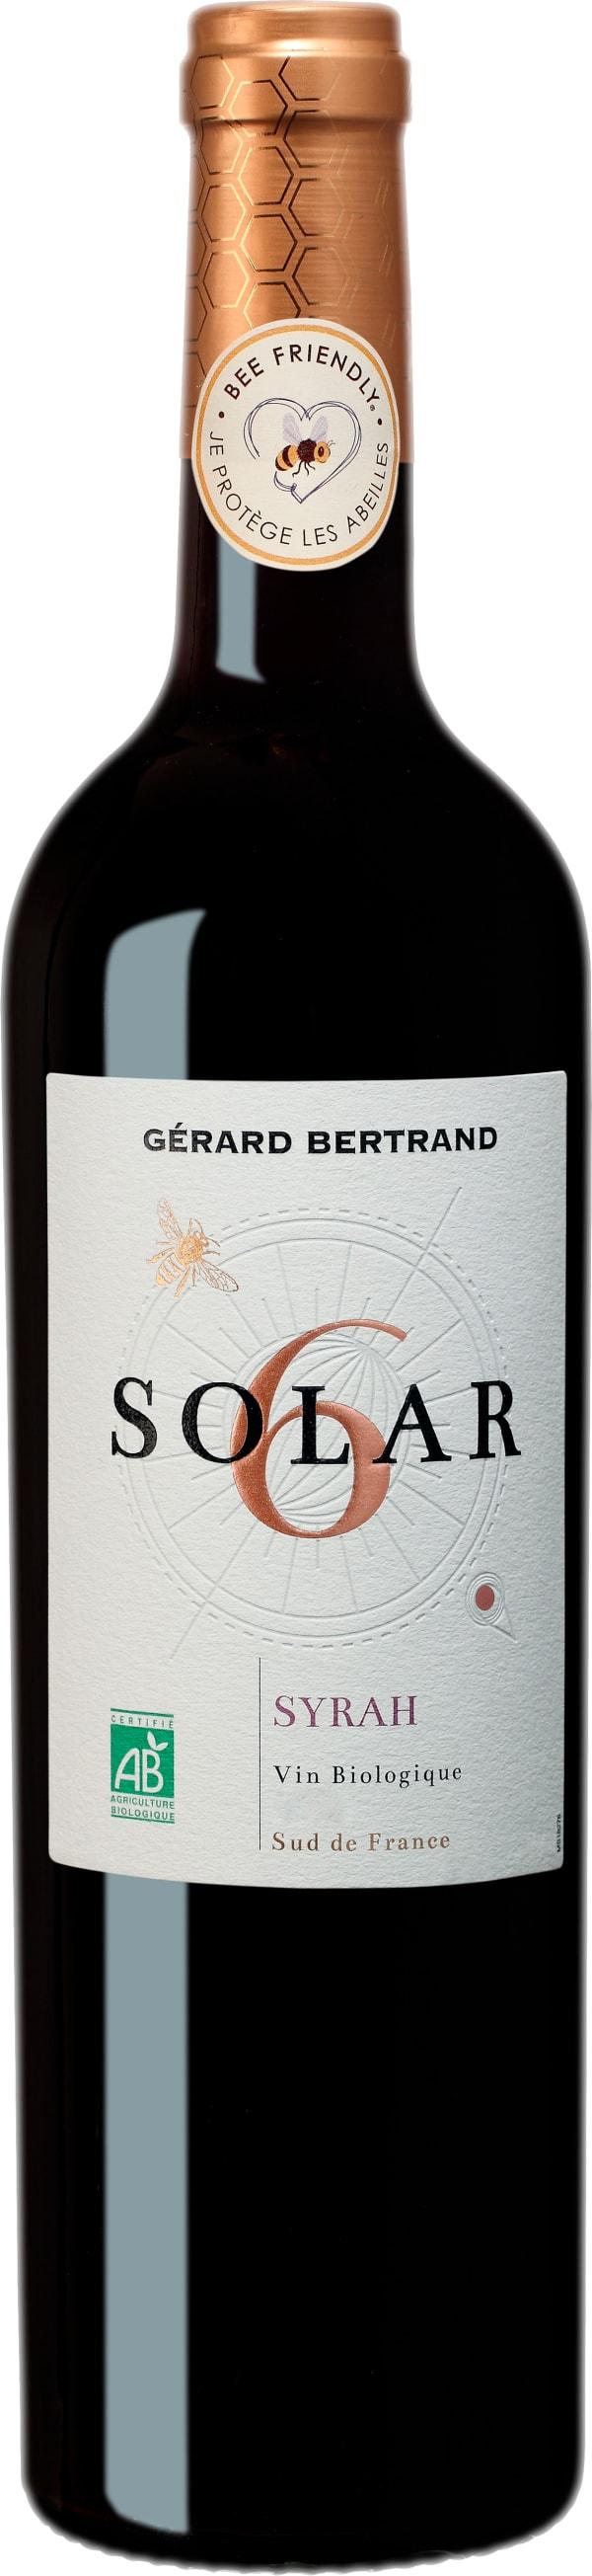 Gérard Bertrand Solar 6 Bee Friendly Syrah 2018